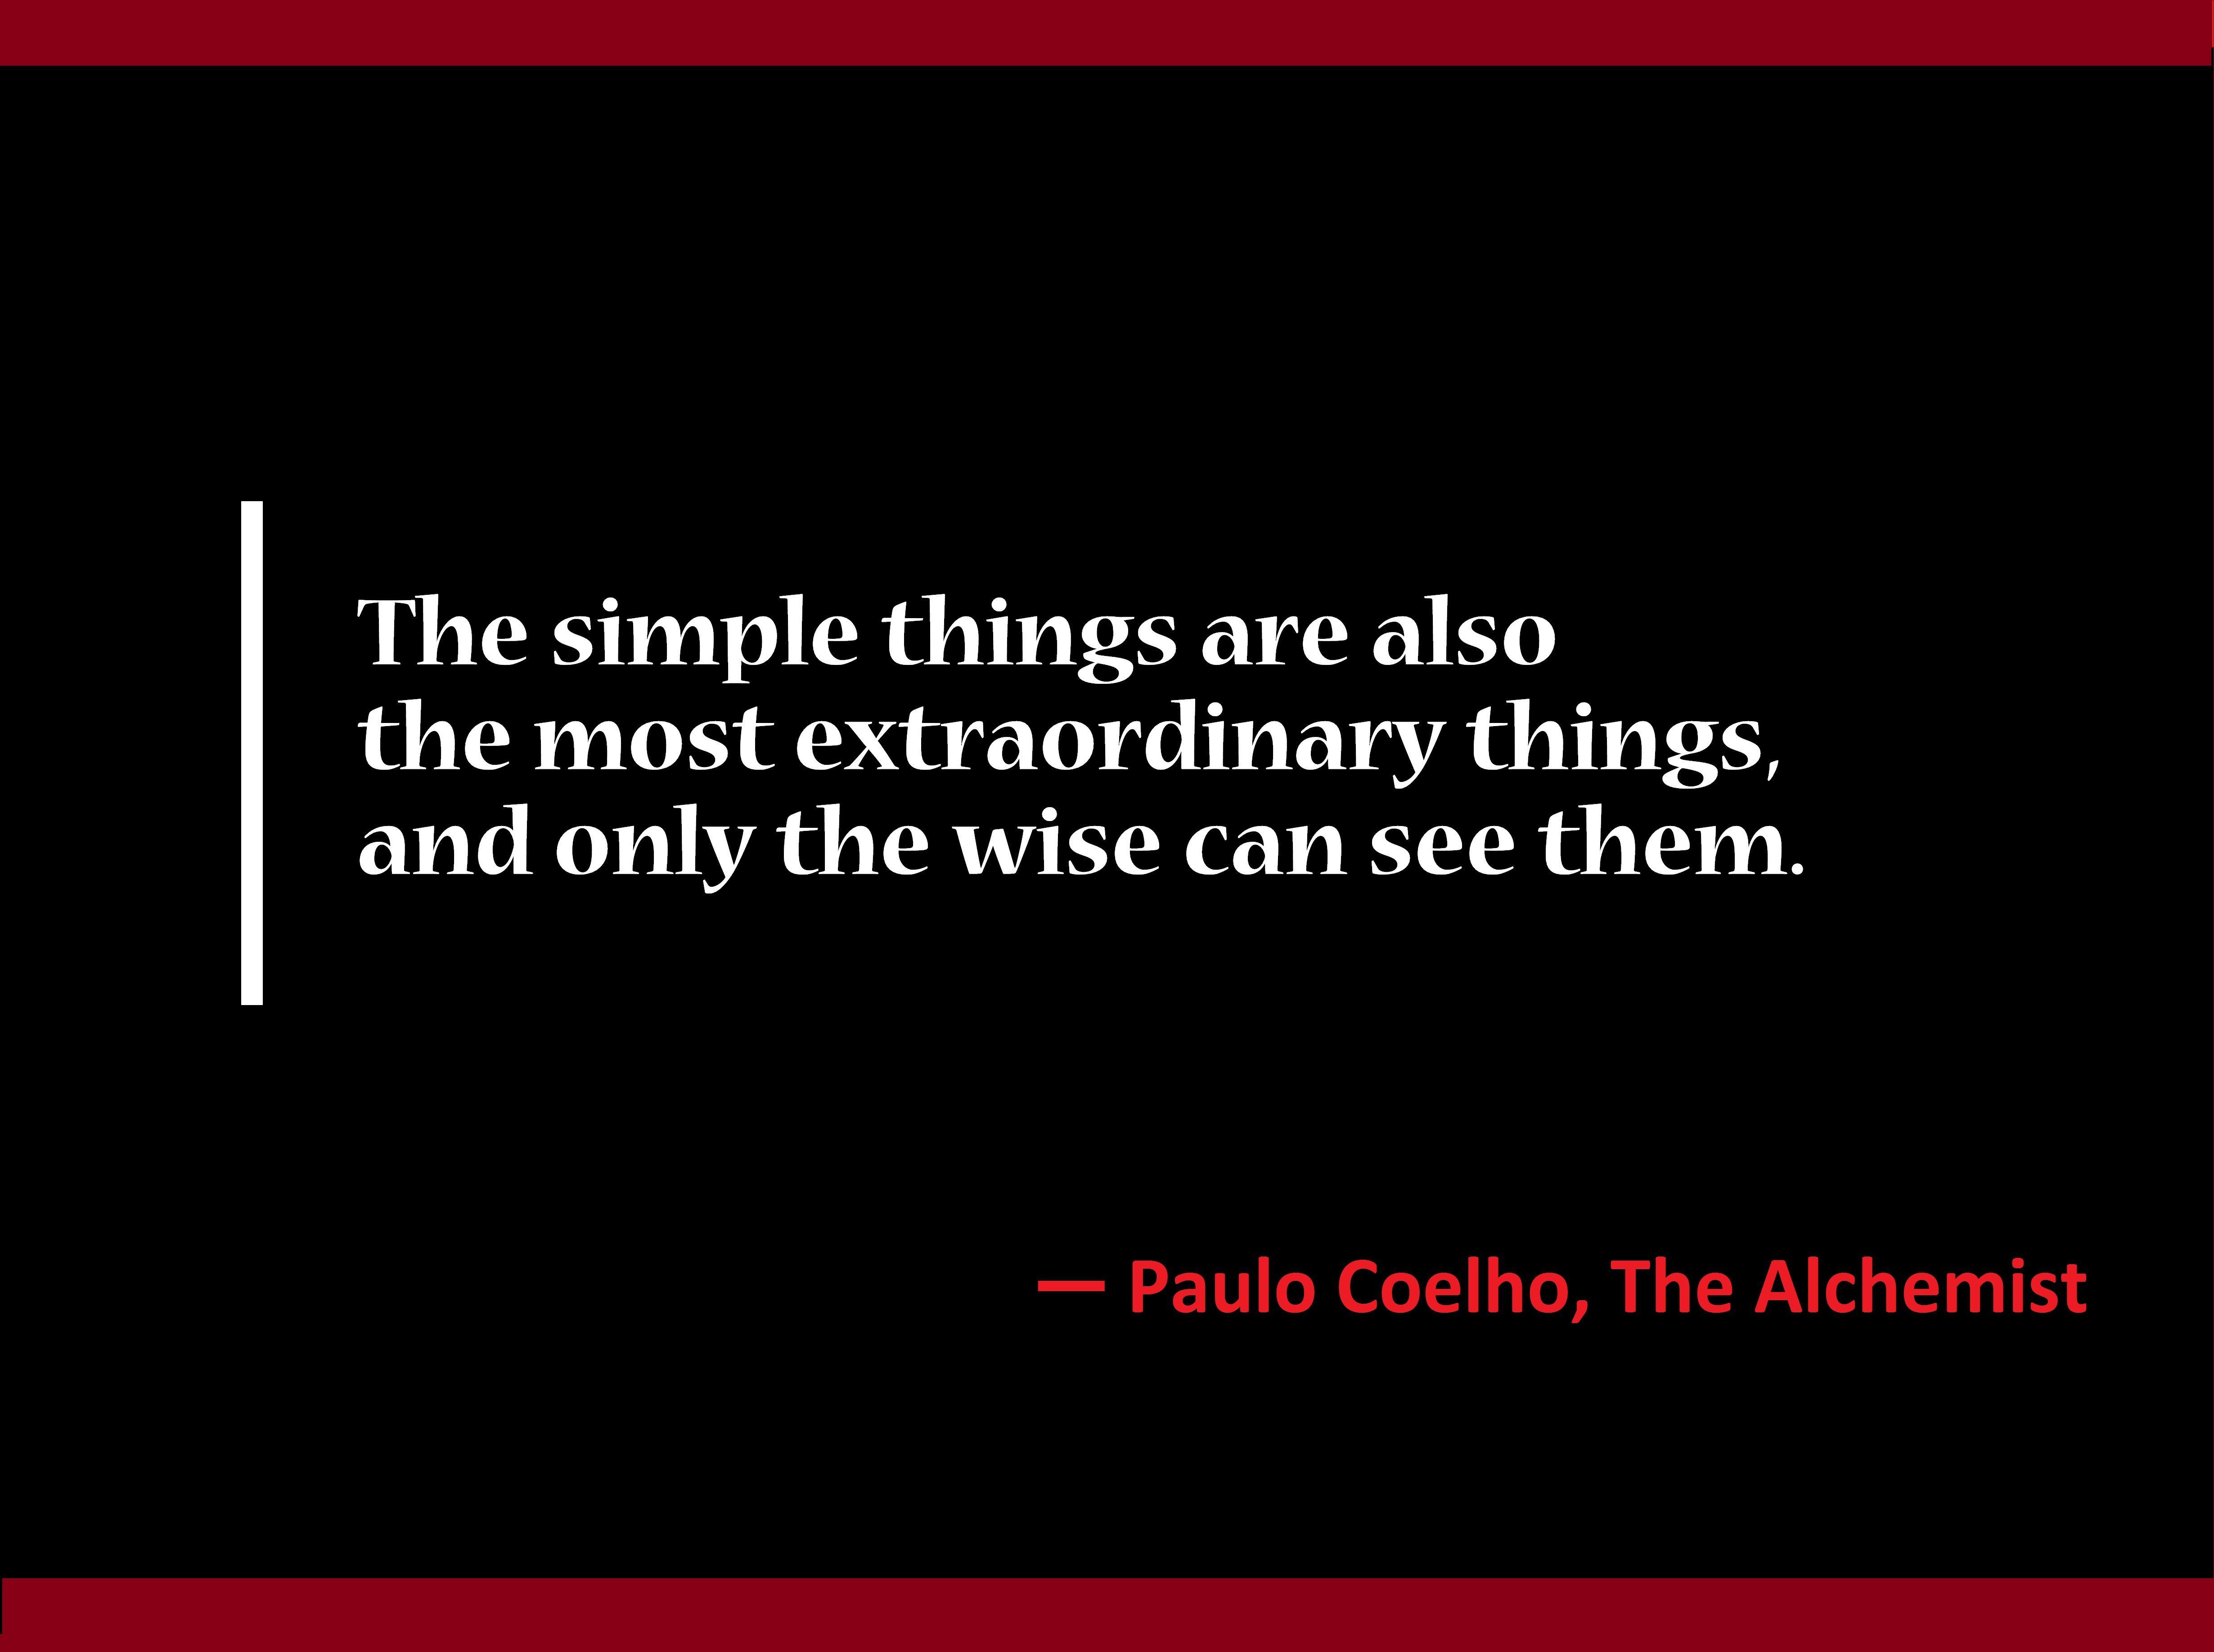 All Quotes from The Alchemist (Paulo Coelho) - JackSparo